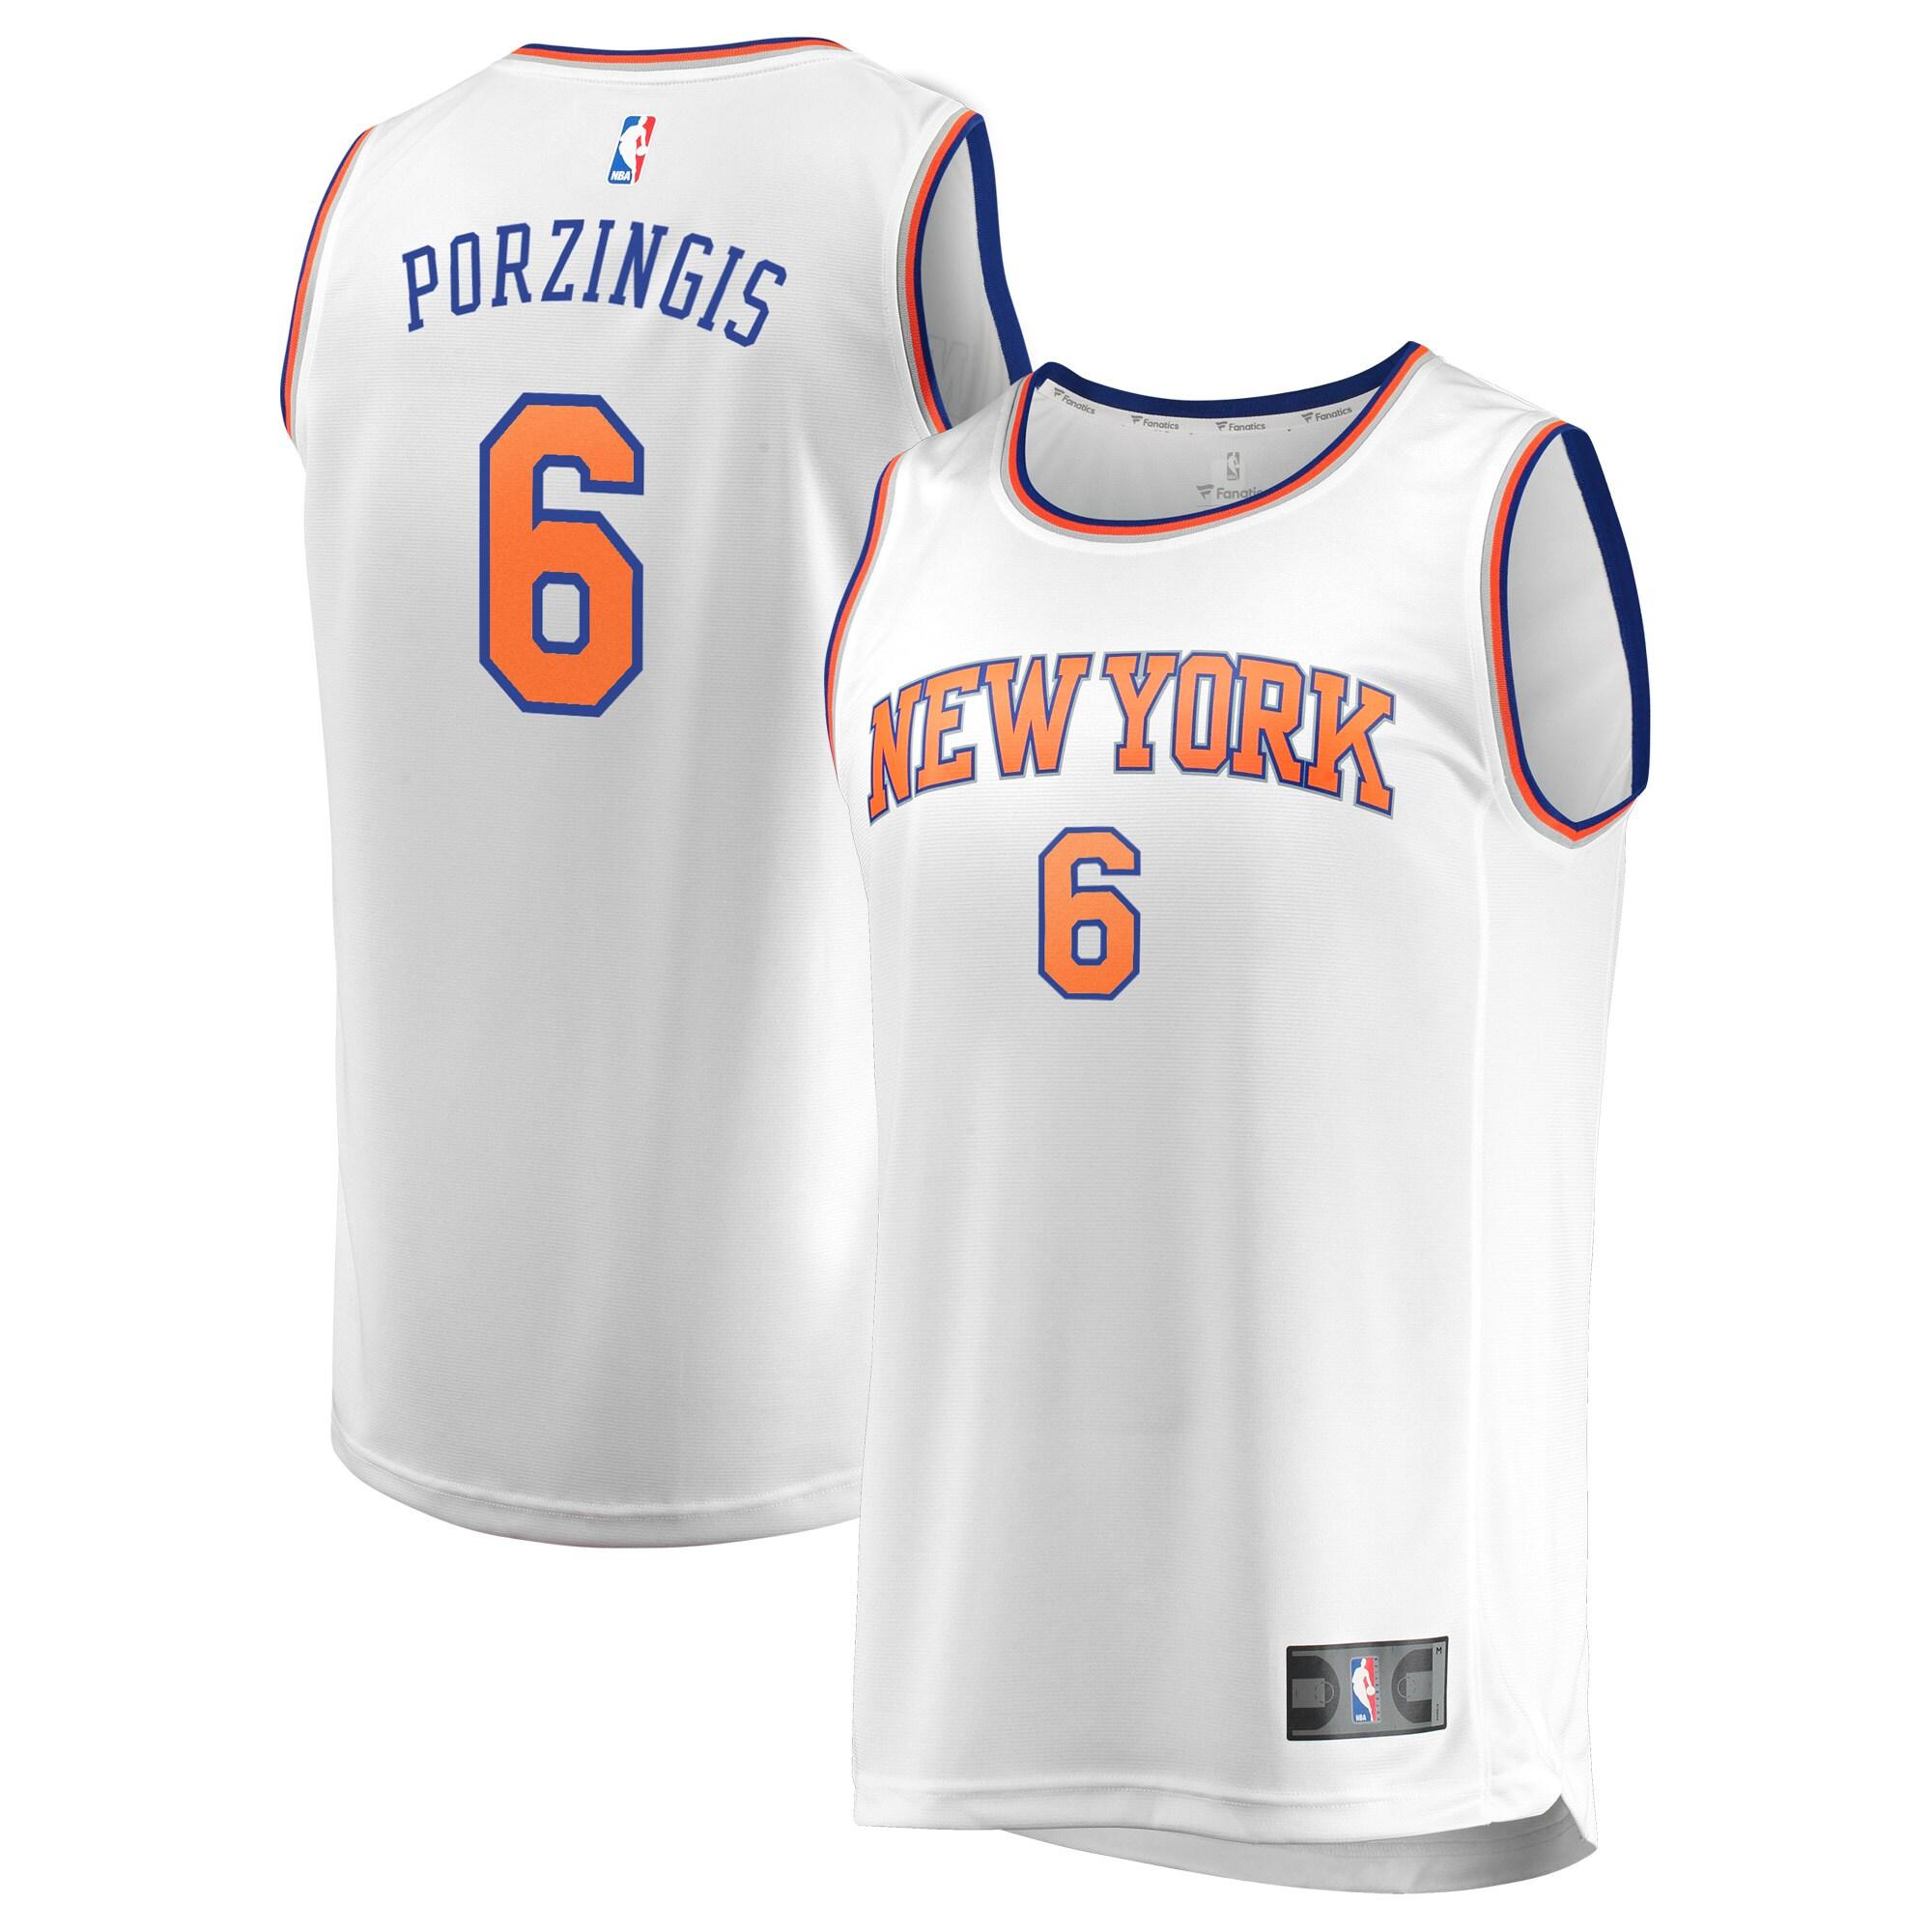 Kristaps Porzingis New York Knicks Fanatics Branded Fast Break Replica Jersey White - Association Edition